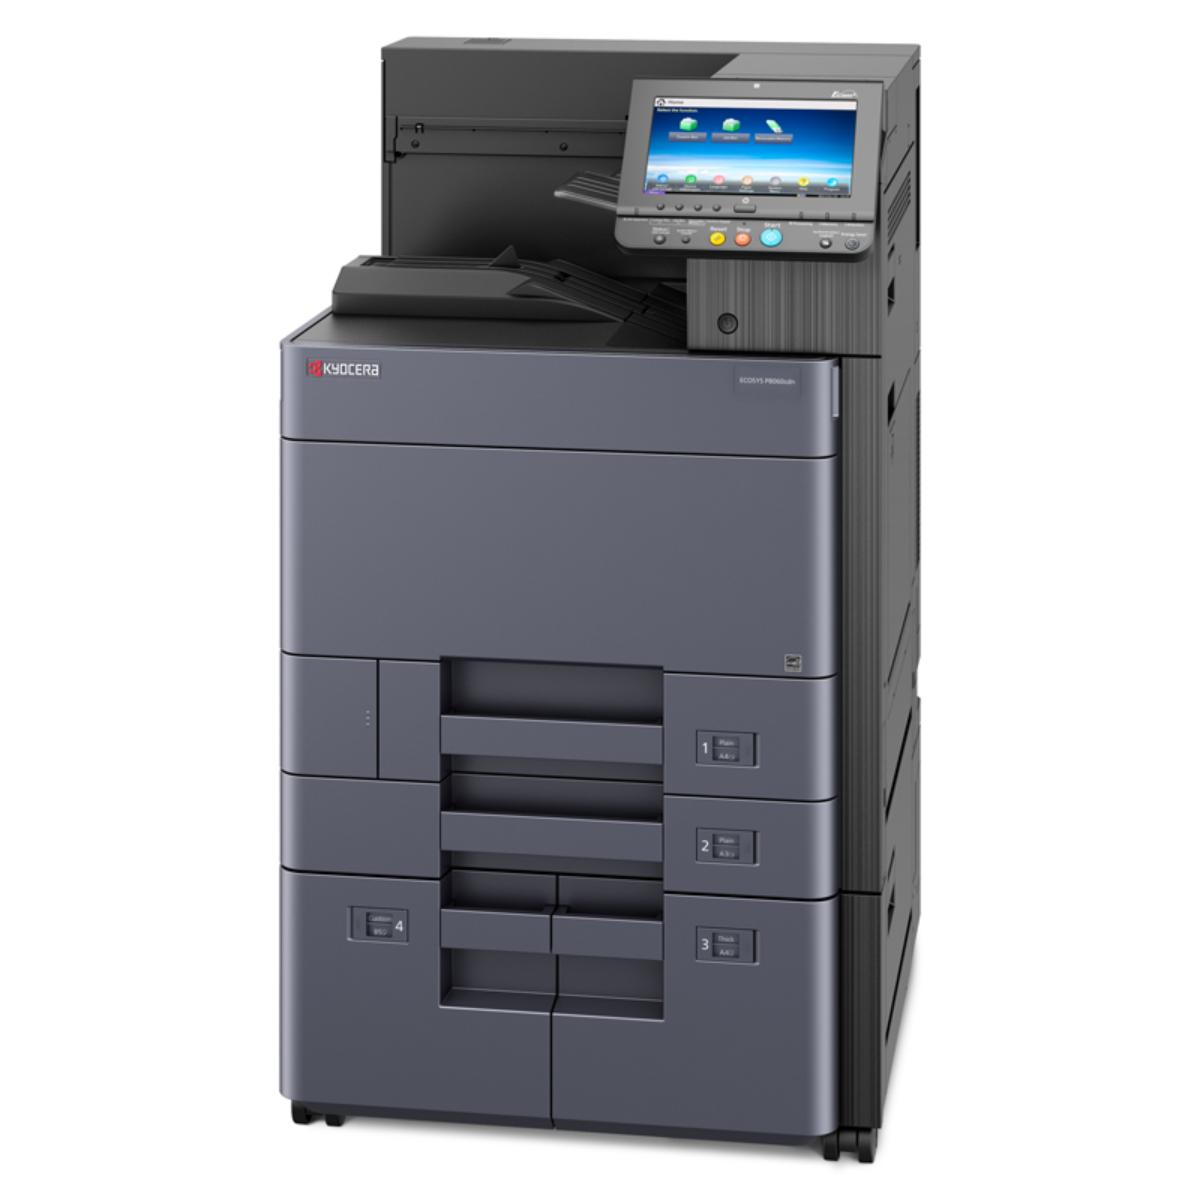 Ecosys P8060cdn fargeprinter og kopimaskin